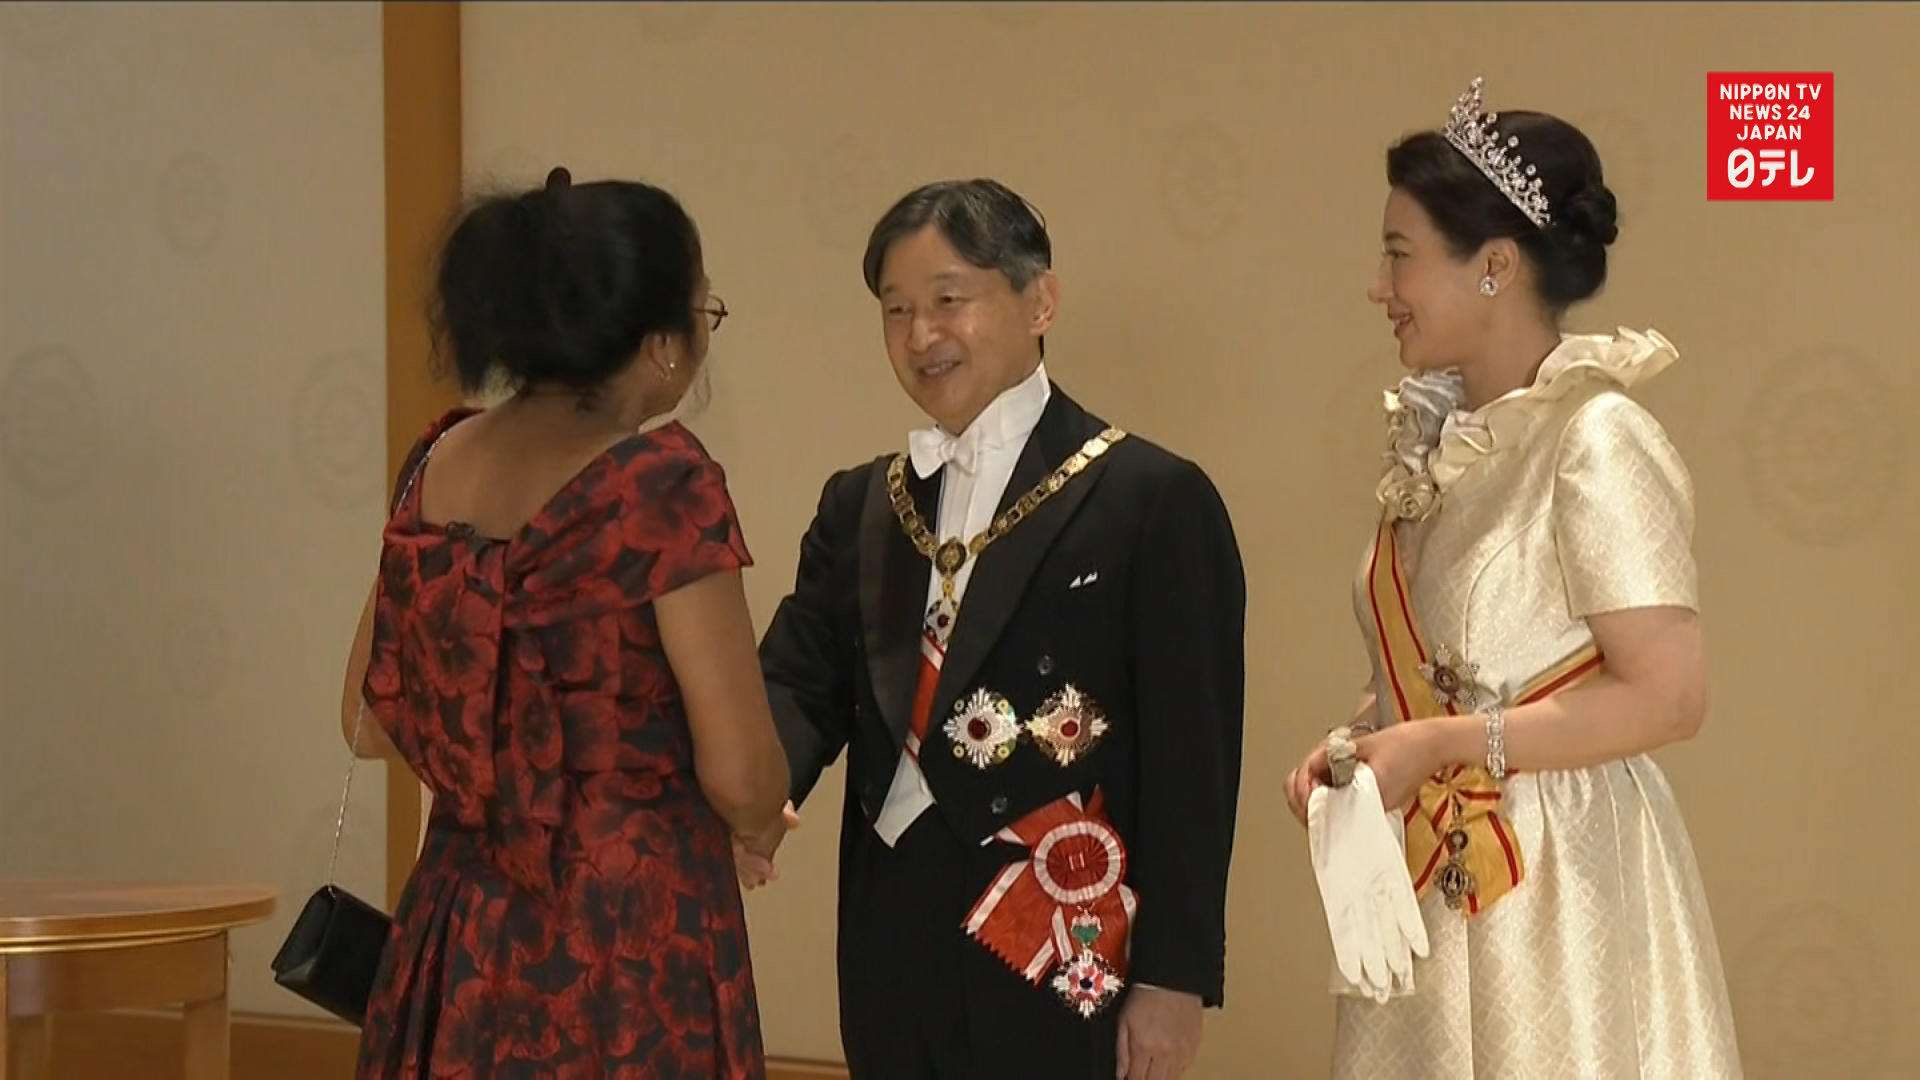 Banquet celebrates Emperor Naruhito's enthronement